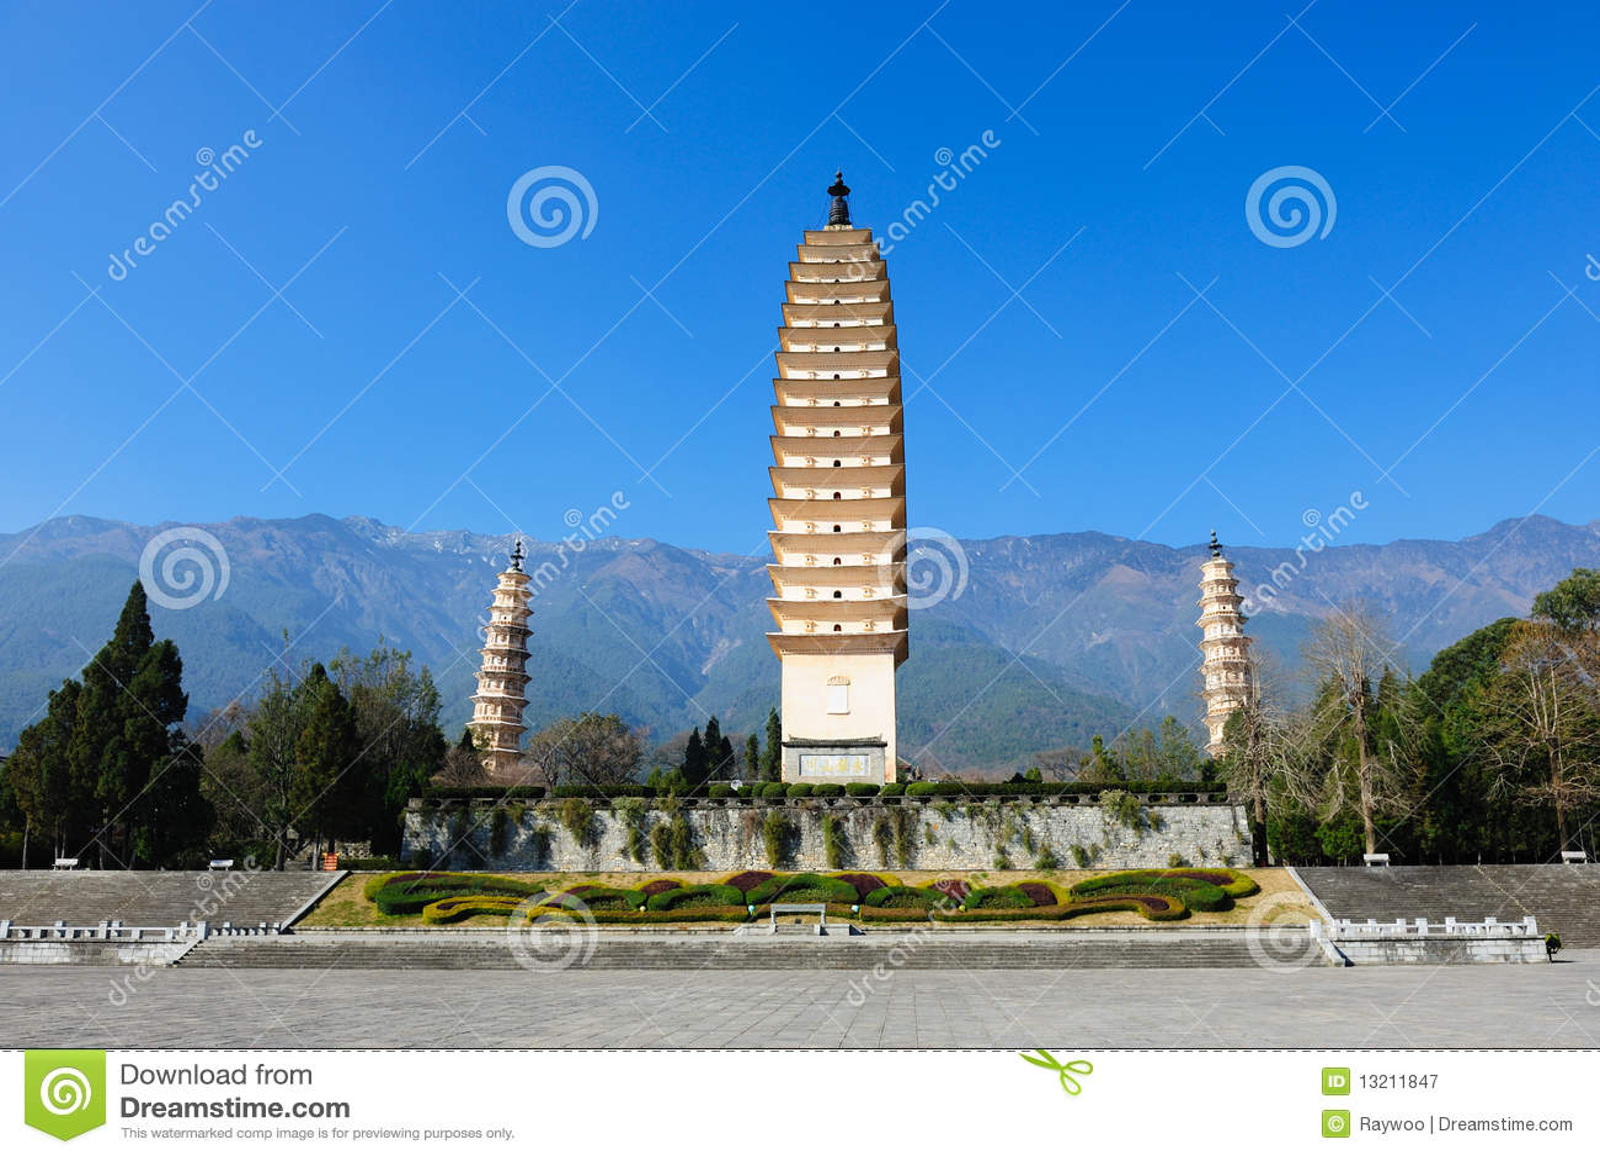 Chinese Buddhist pagodas